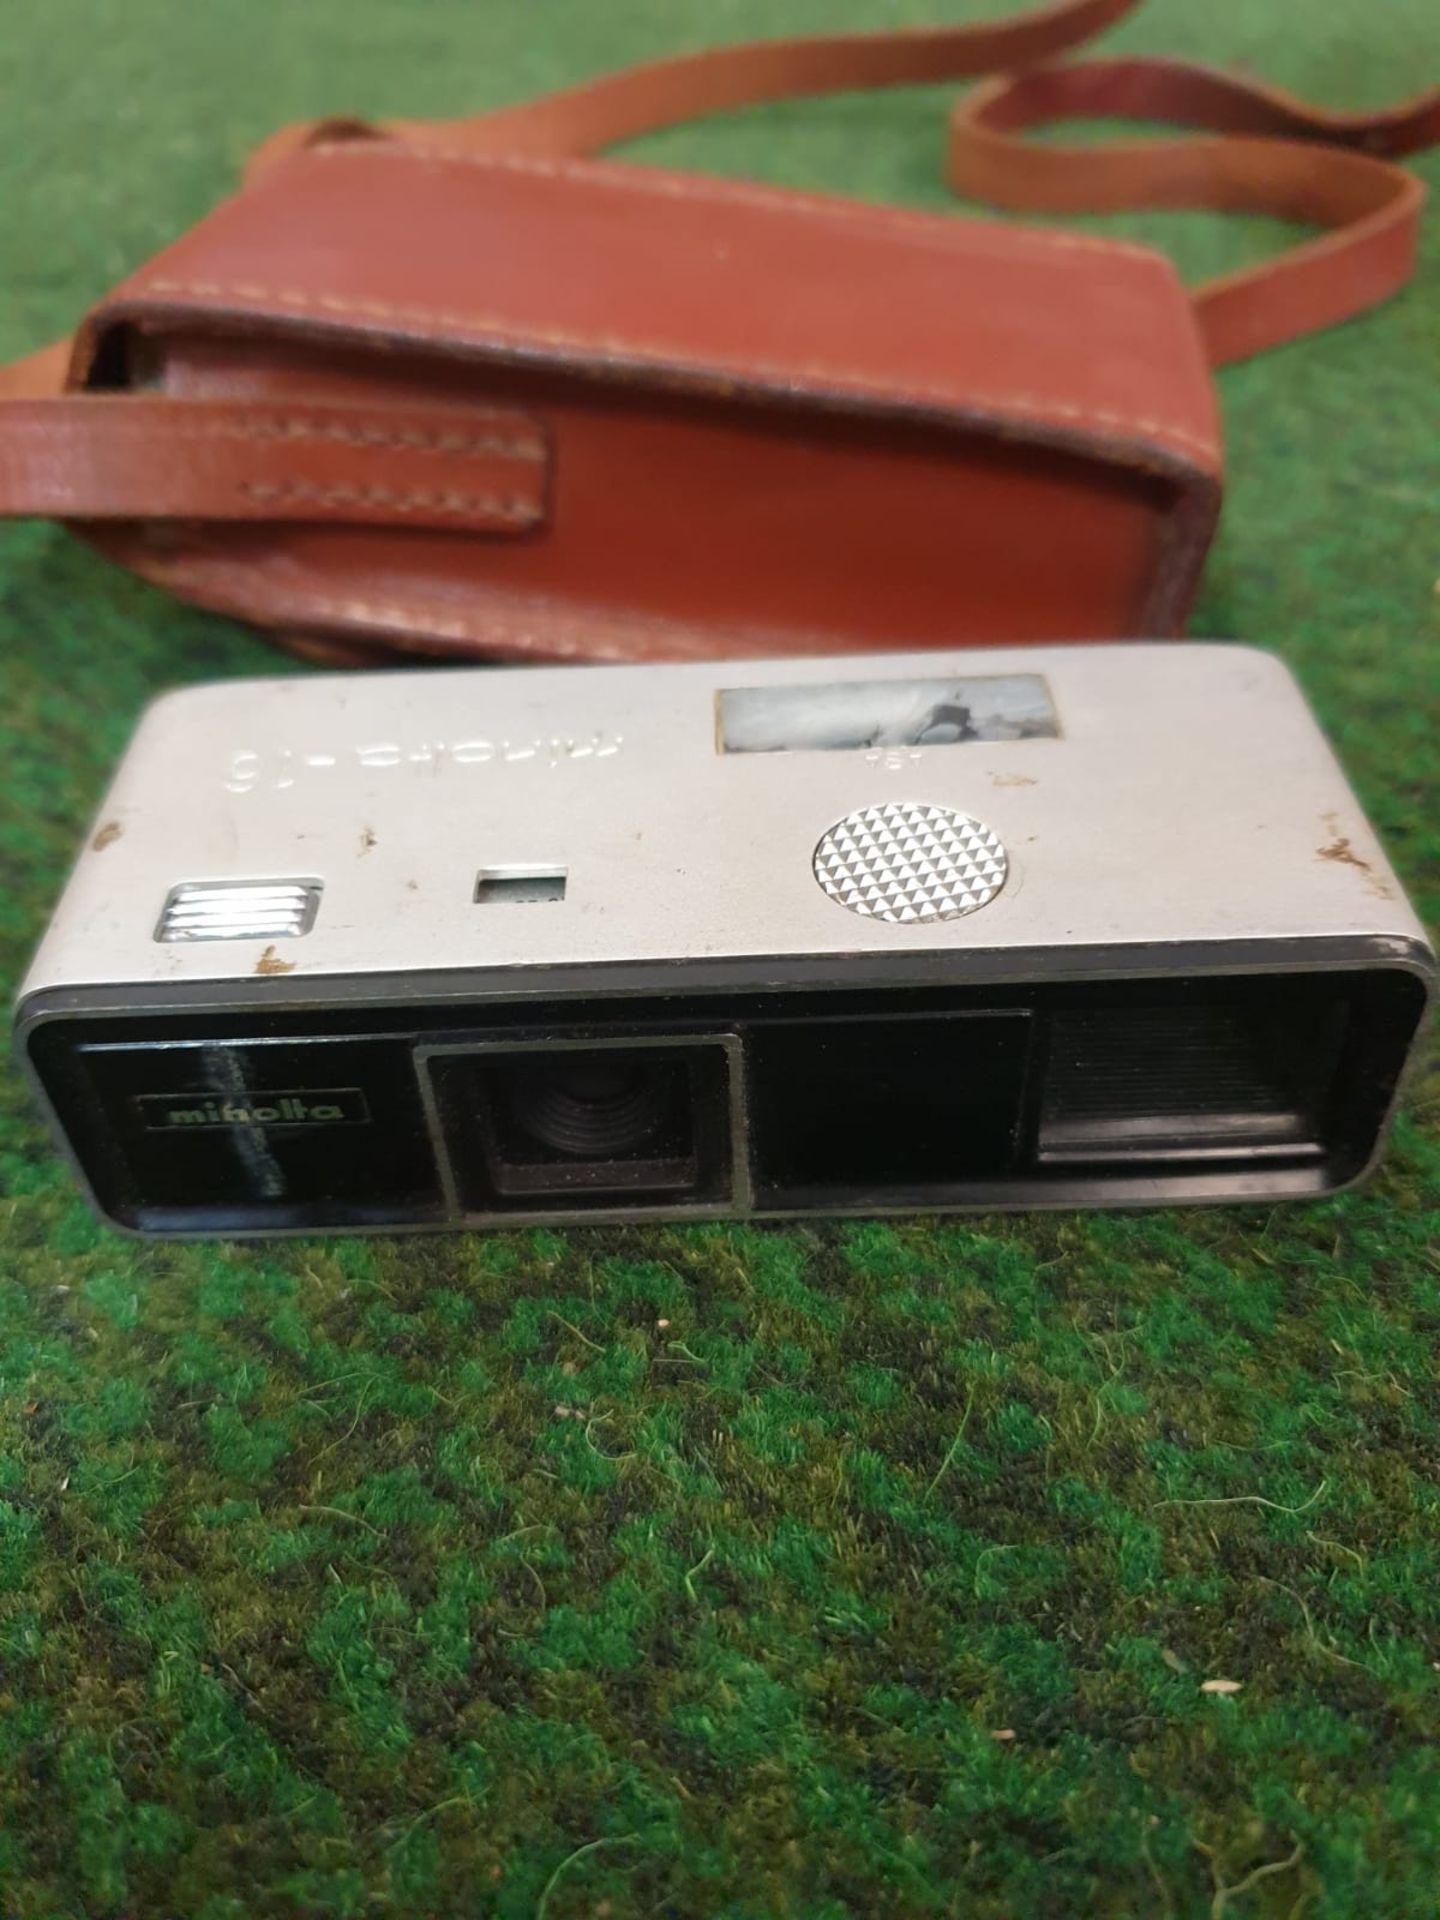 Minolta 16 Model P Rokkor 3.5/25 Subminiature Film Camera with case 1960's 103×27×42mm - Image 3 of 3